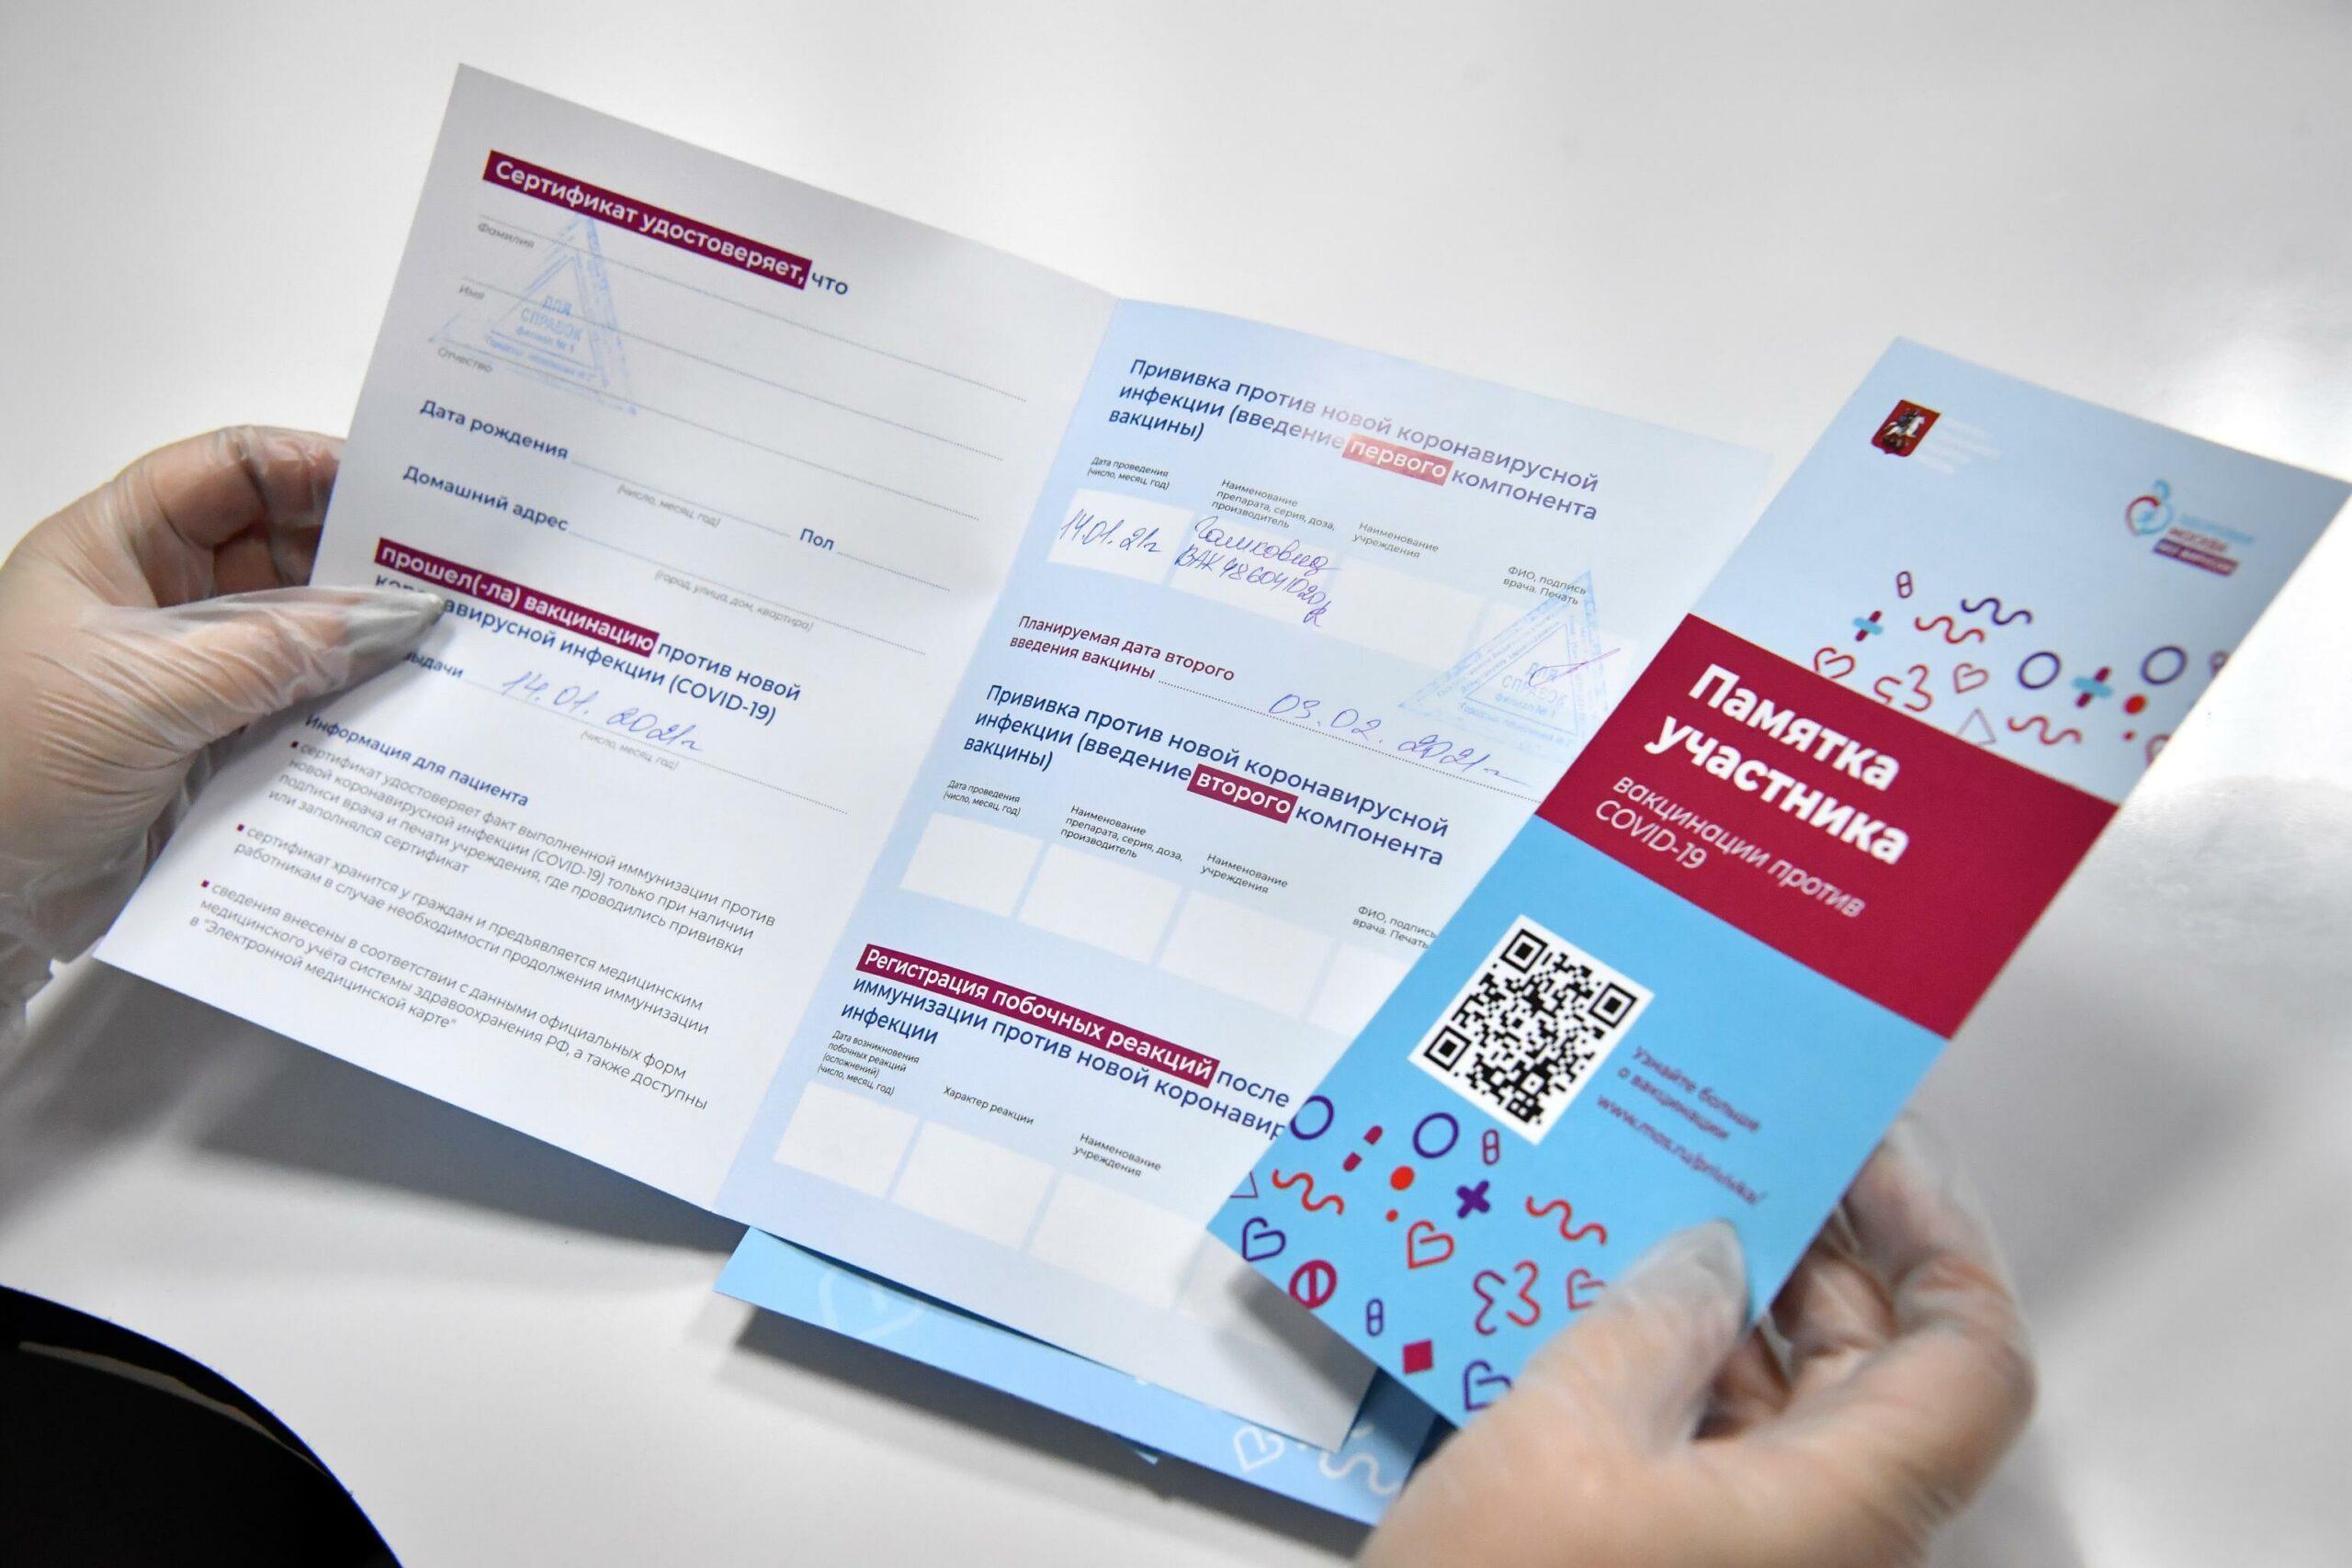 Как получить сертификат о вакцинации от COVID-19